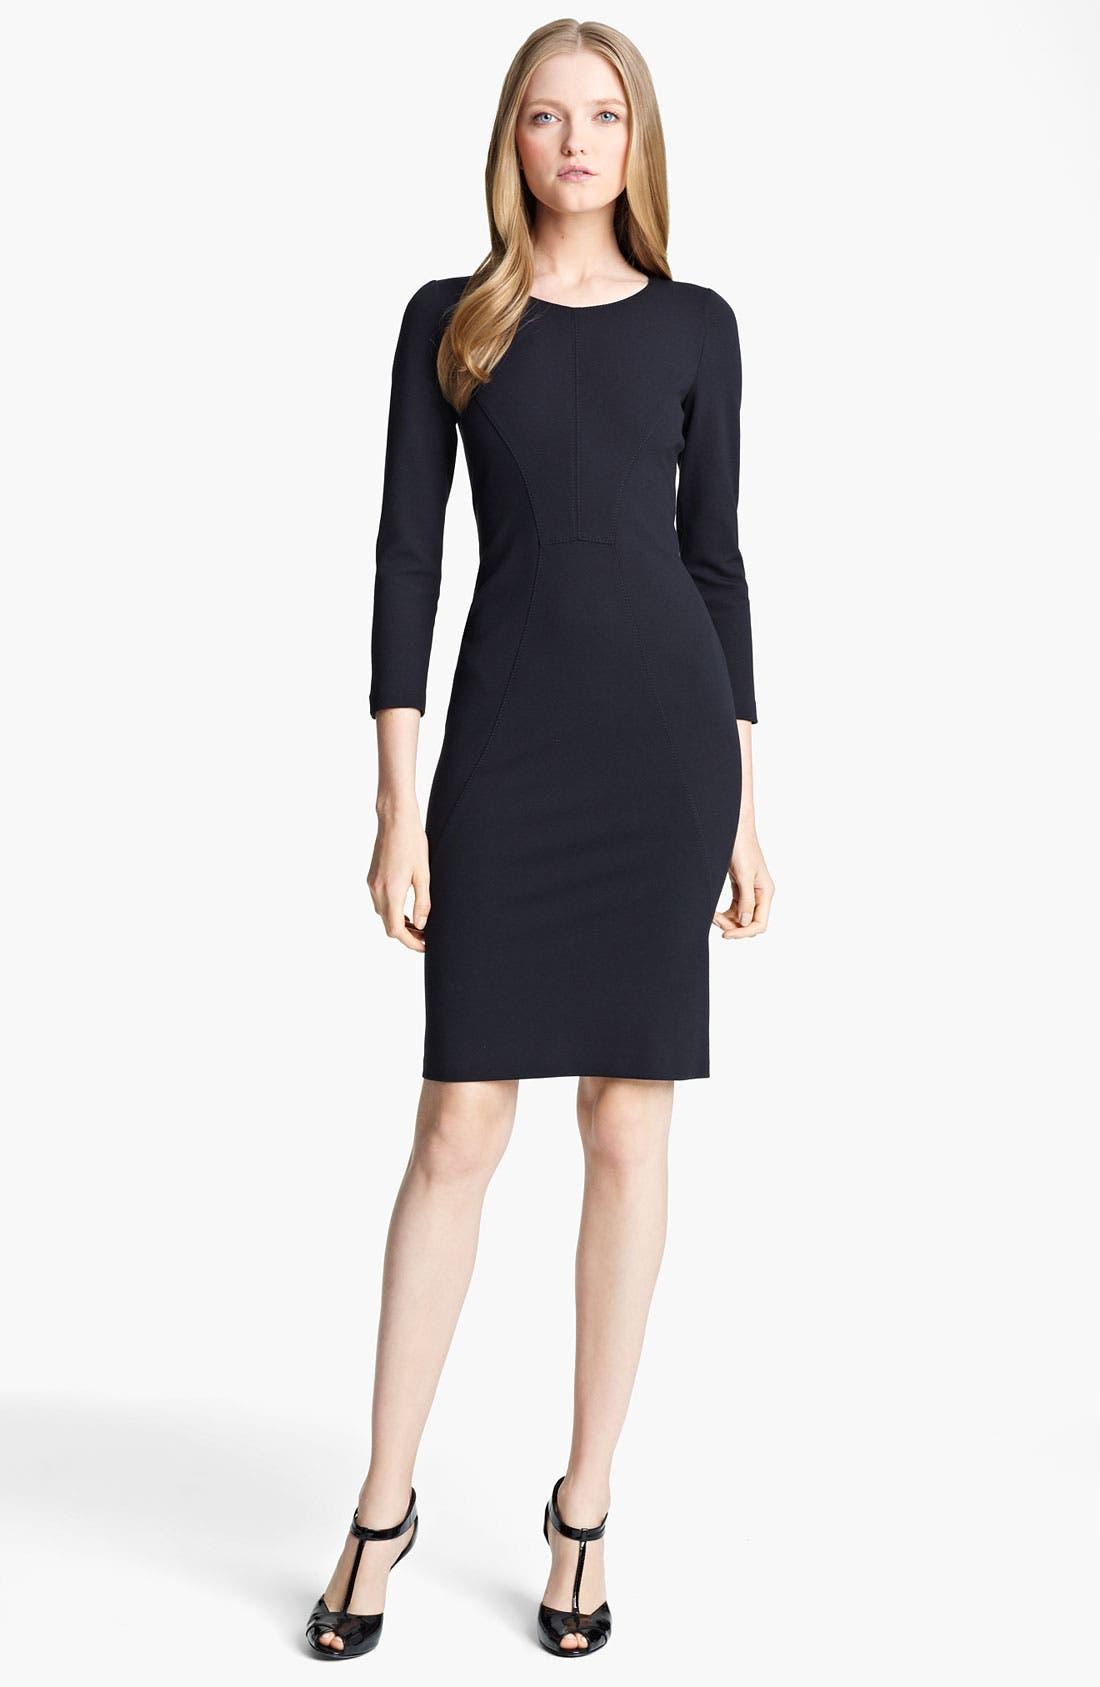 Alternate Image 1 Selected - Armani Collezioni Jersey Dress